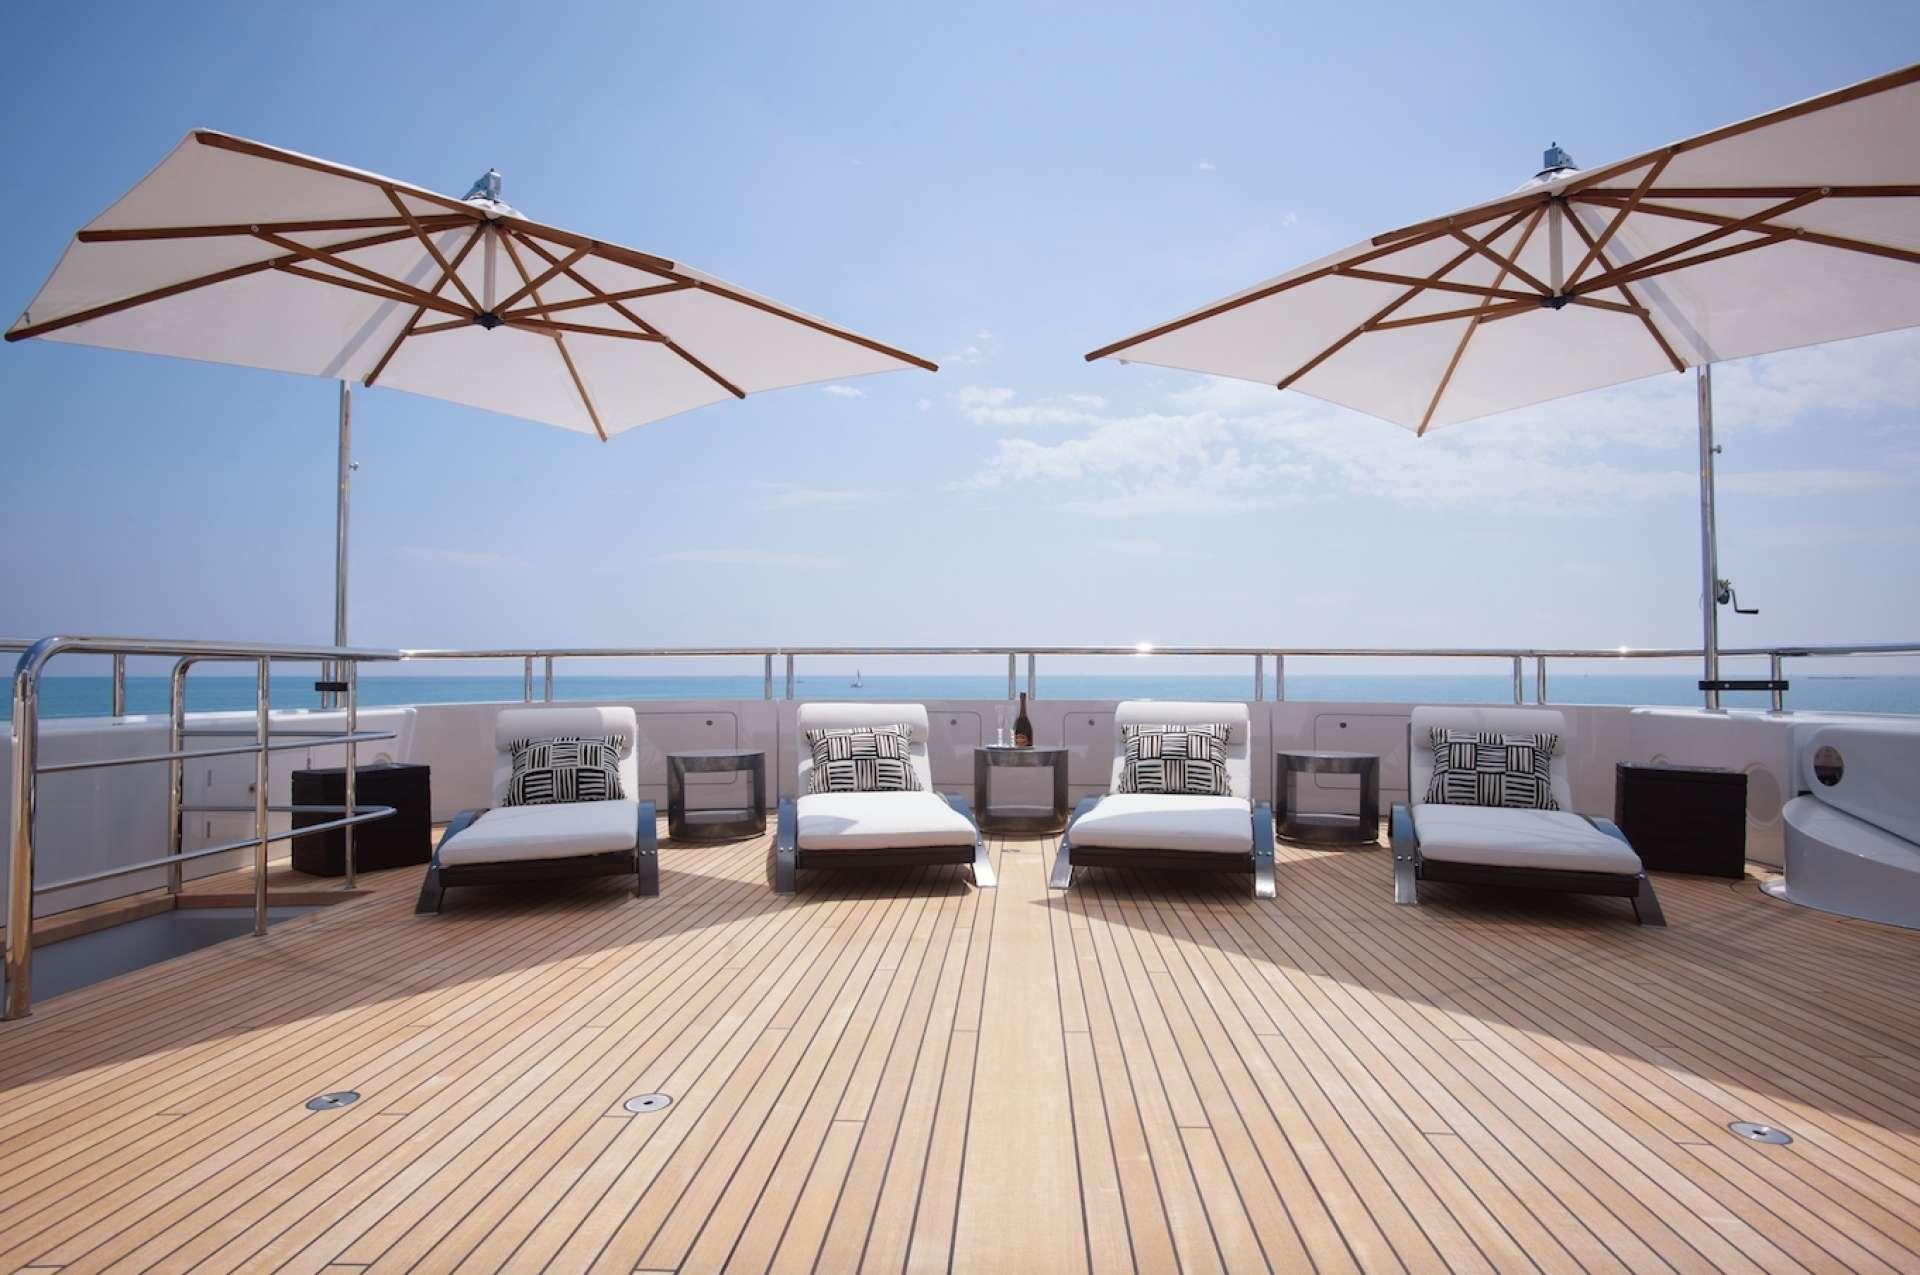 Aft Deck Sunbathing Area